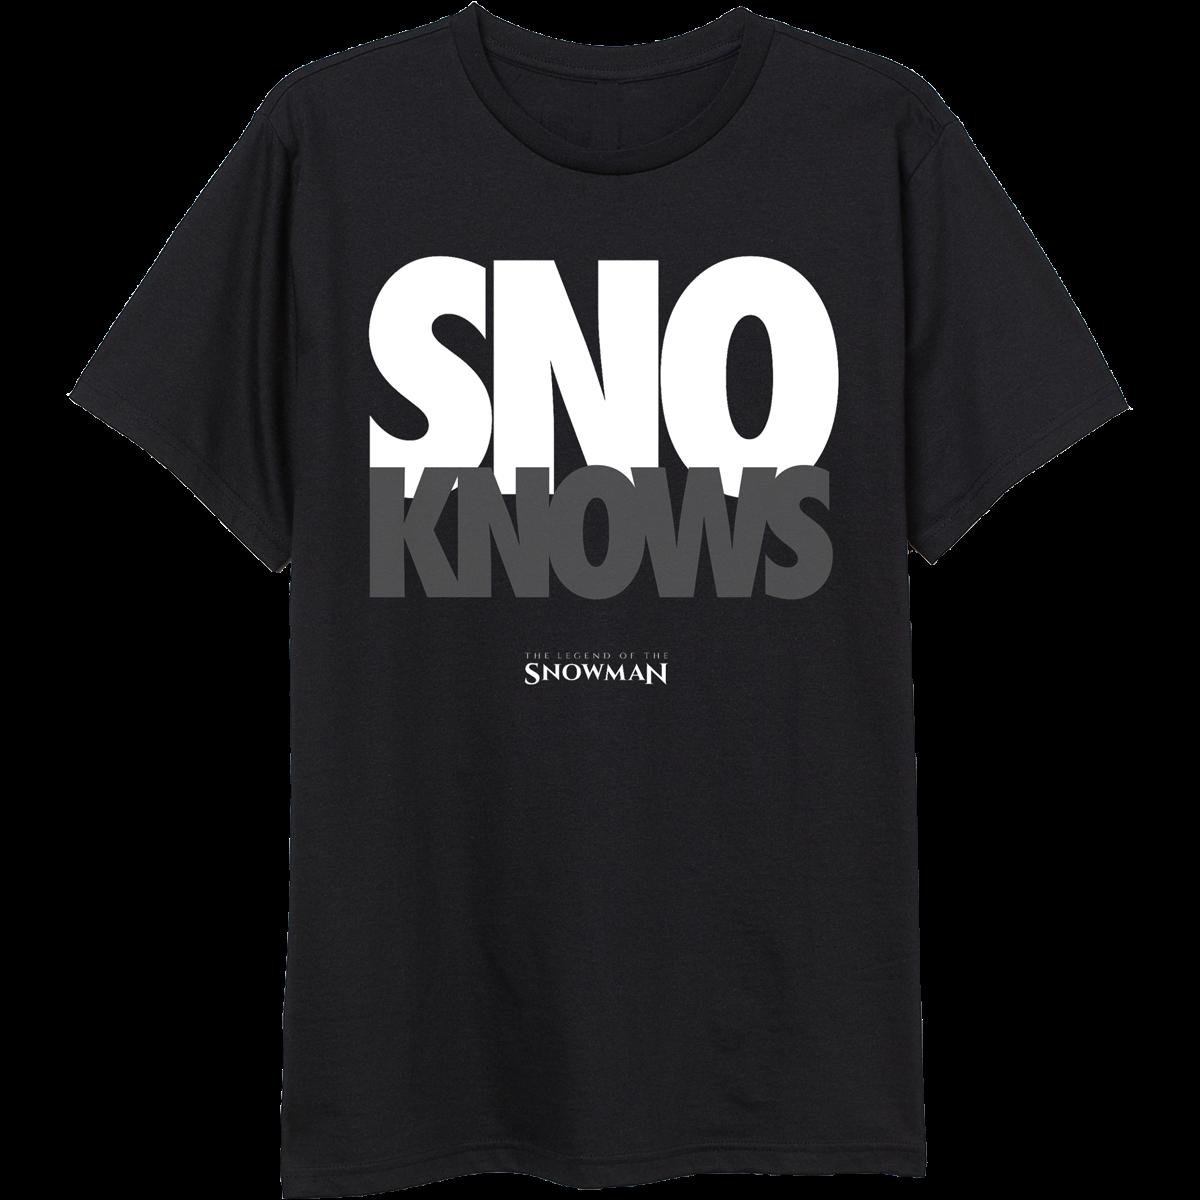 SnoKnows T-Shirt & TM104 Digital Download